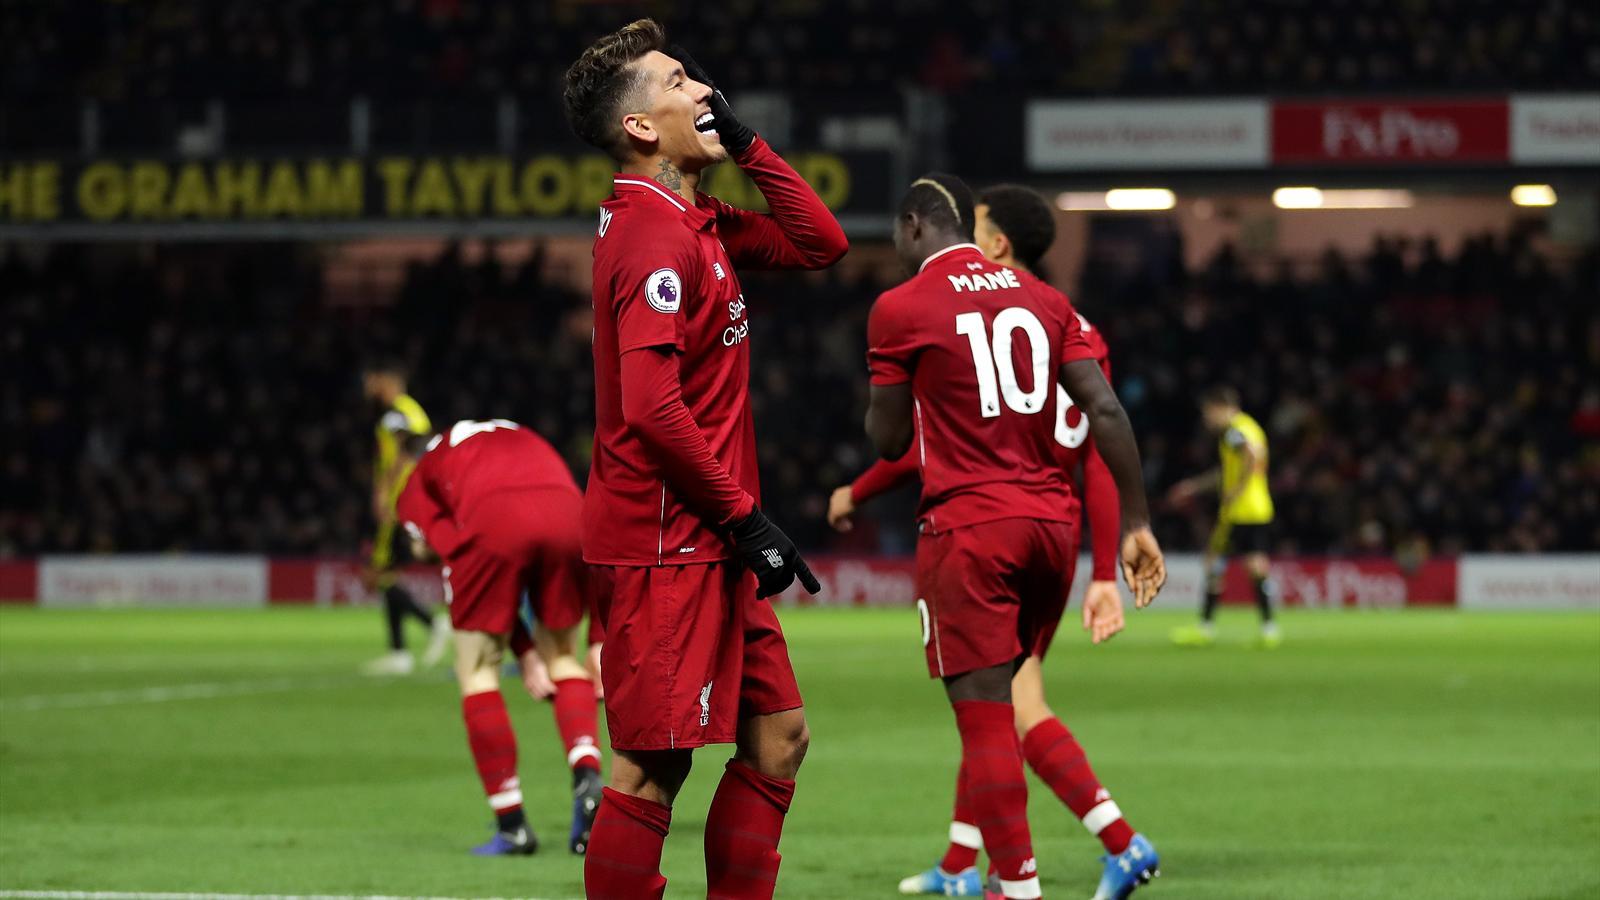 Liverpool Break Down Stubborn Watford To Keep Up City